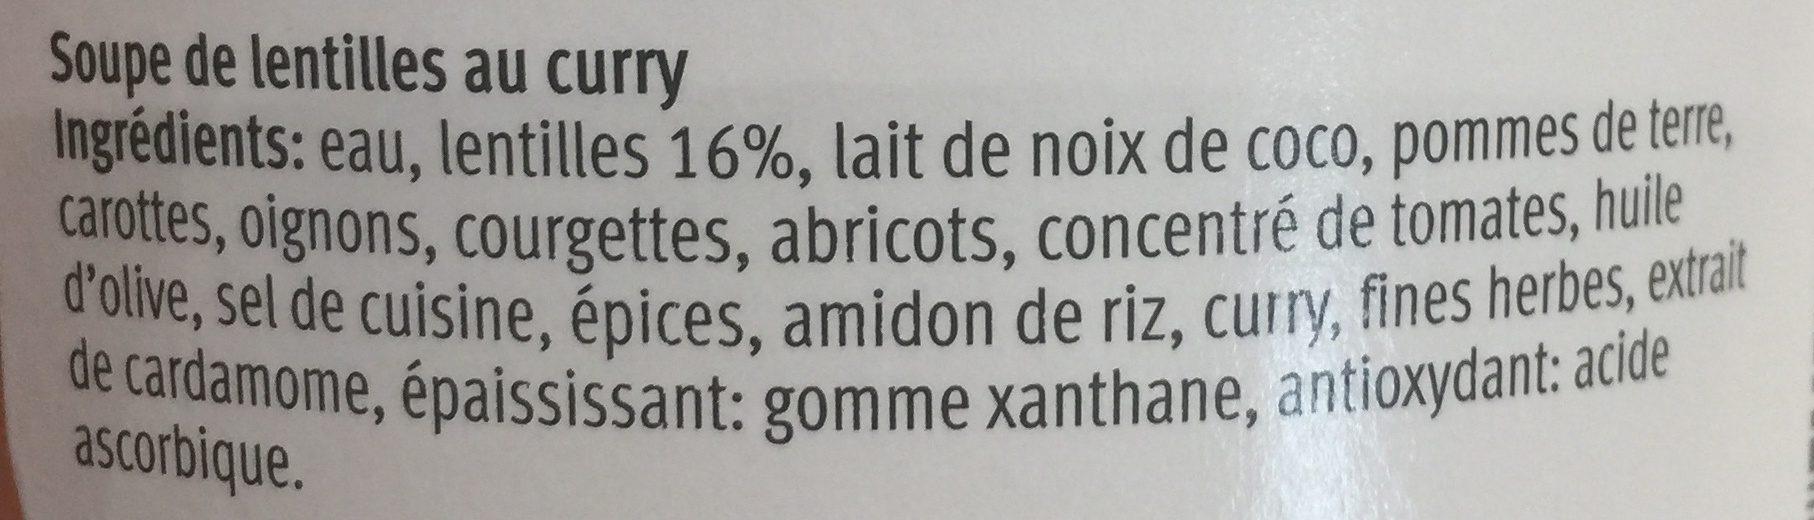 Soupe lentille curry - Ingrediënten - fr